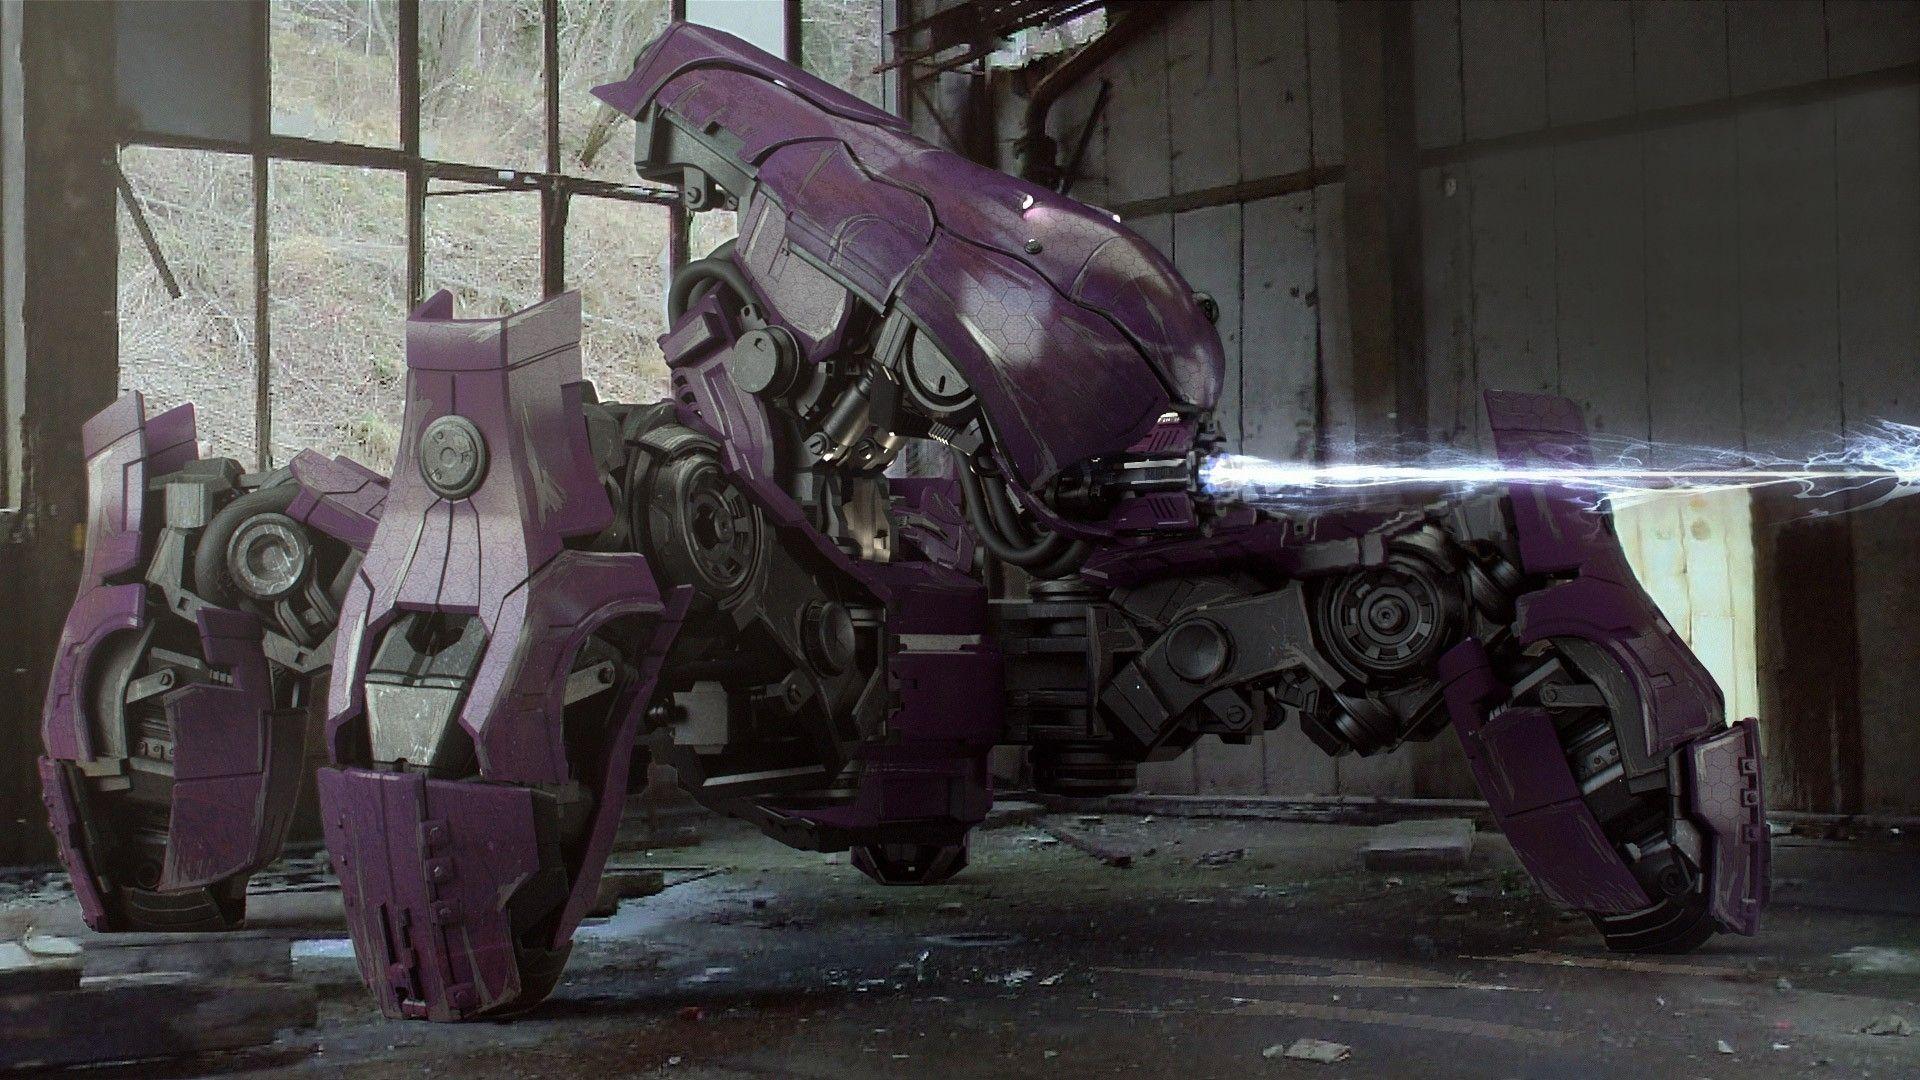 Military Robots Purple Laser Halo War Machine Fallen Wars 1920x1080 Wallpaper